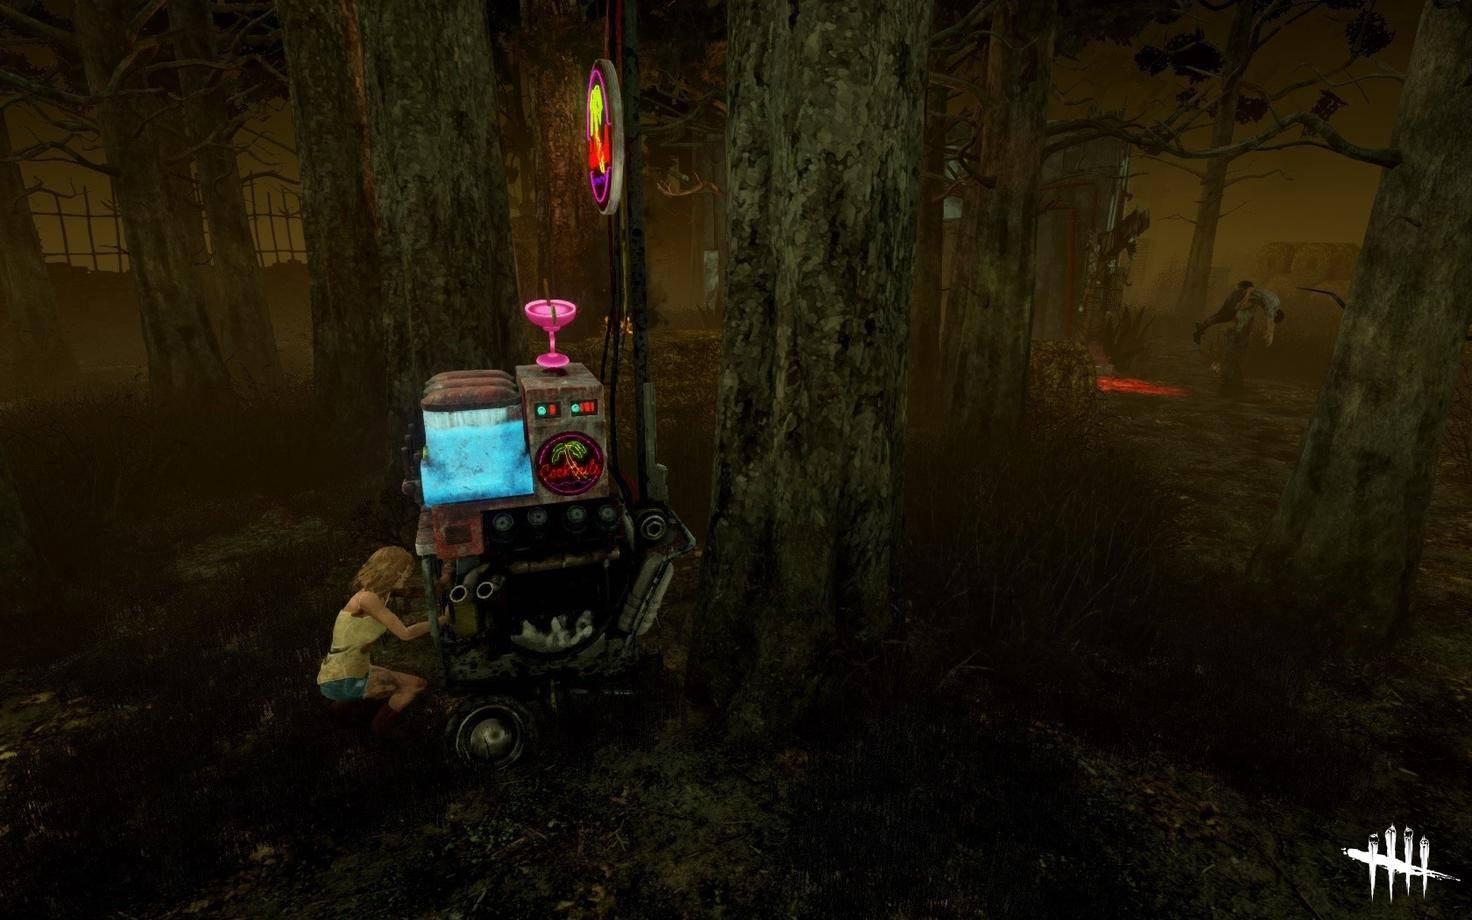 Man schraubt an einem Generator, während der Killer rechts im Bild sein Opfer anschleppt – da muss man cool bleiben.